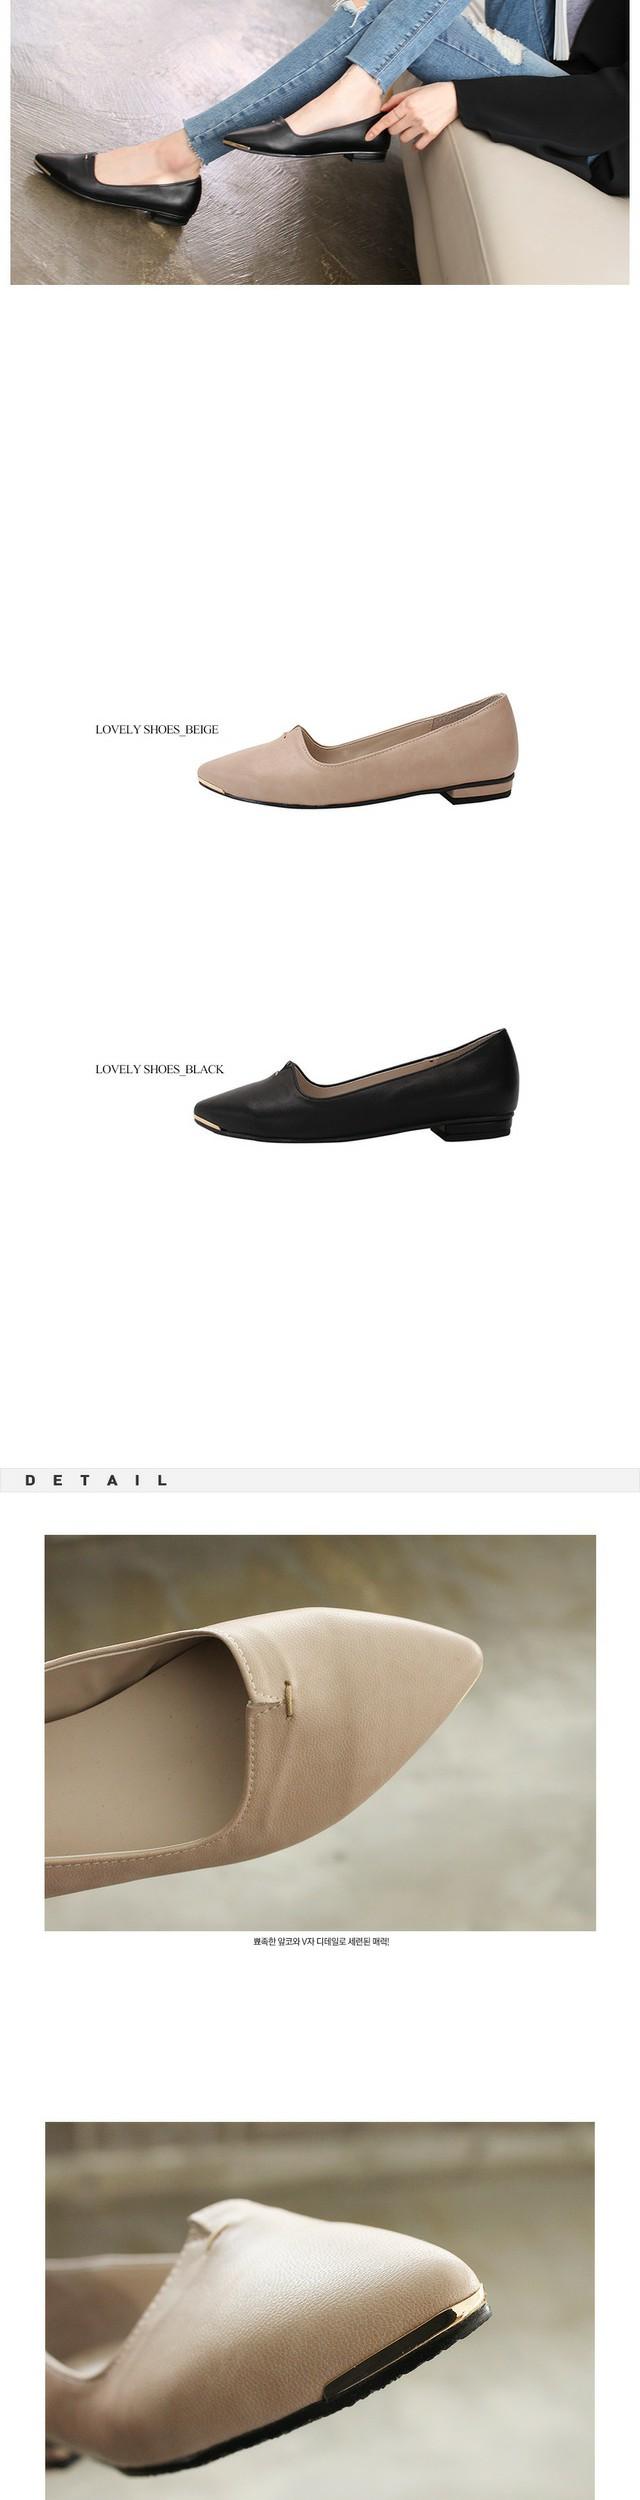 Tee Weave Flat Shoes 3cm